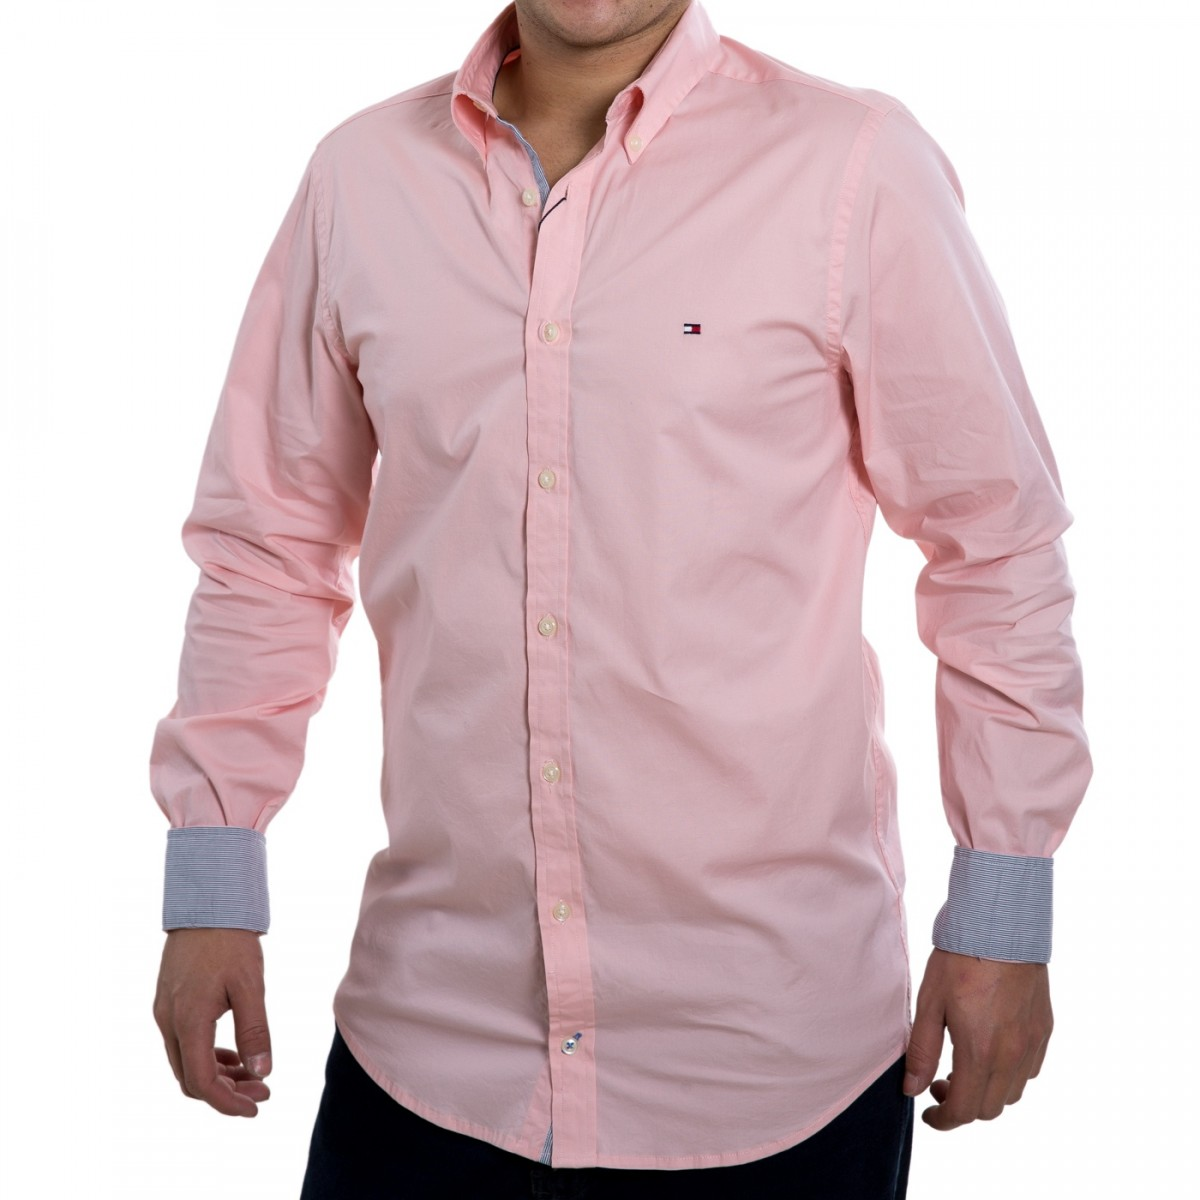 c3aa62446 Camisa Social Masculina Tommy Hilfiger Slim Th0857872321 - Rosa ...